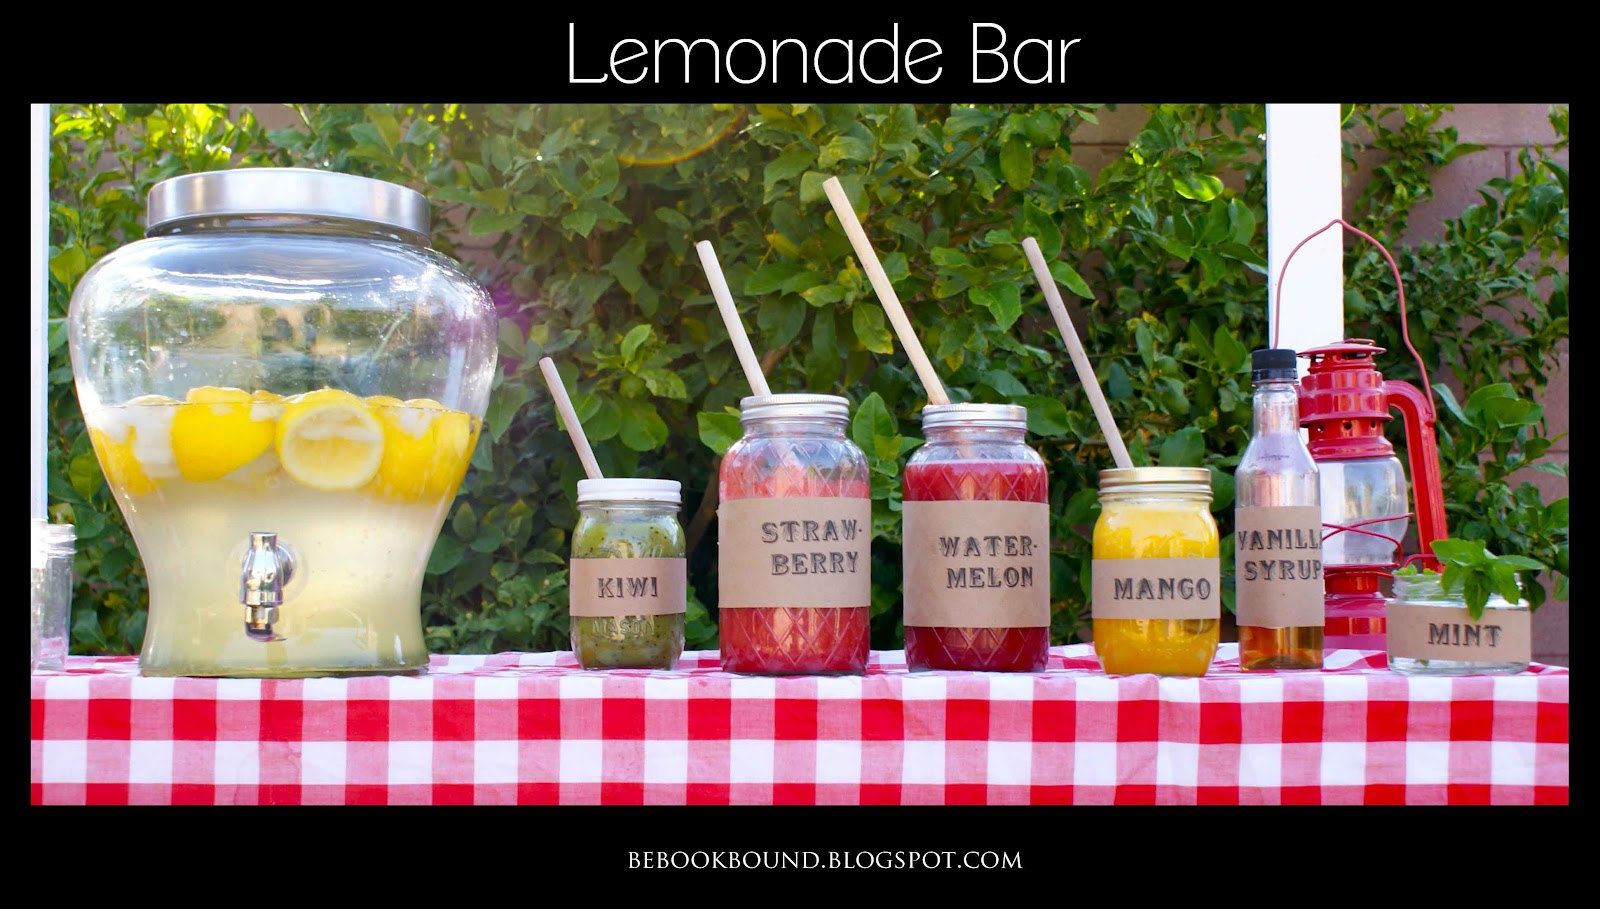 Be book bound little house on the prairie lemonade bar for Cool lemonade stand ideas